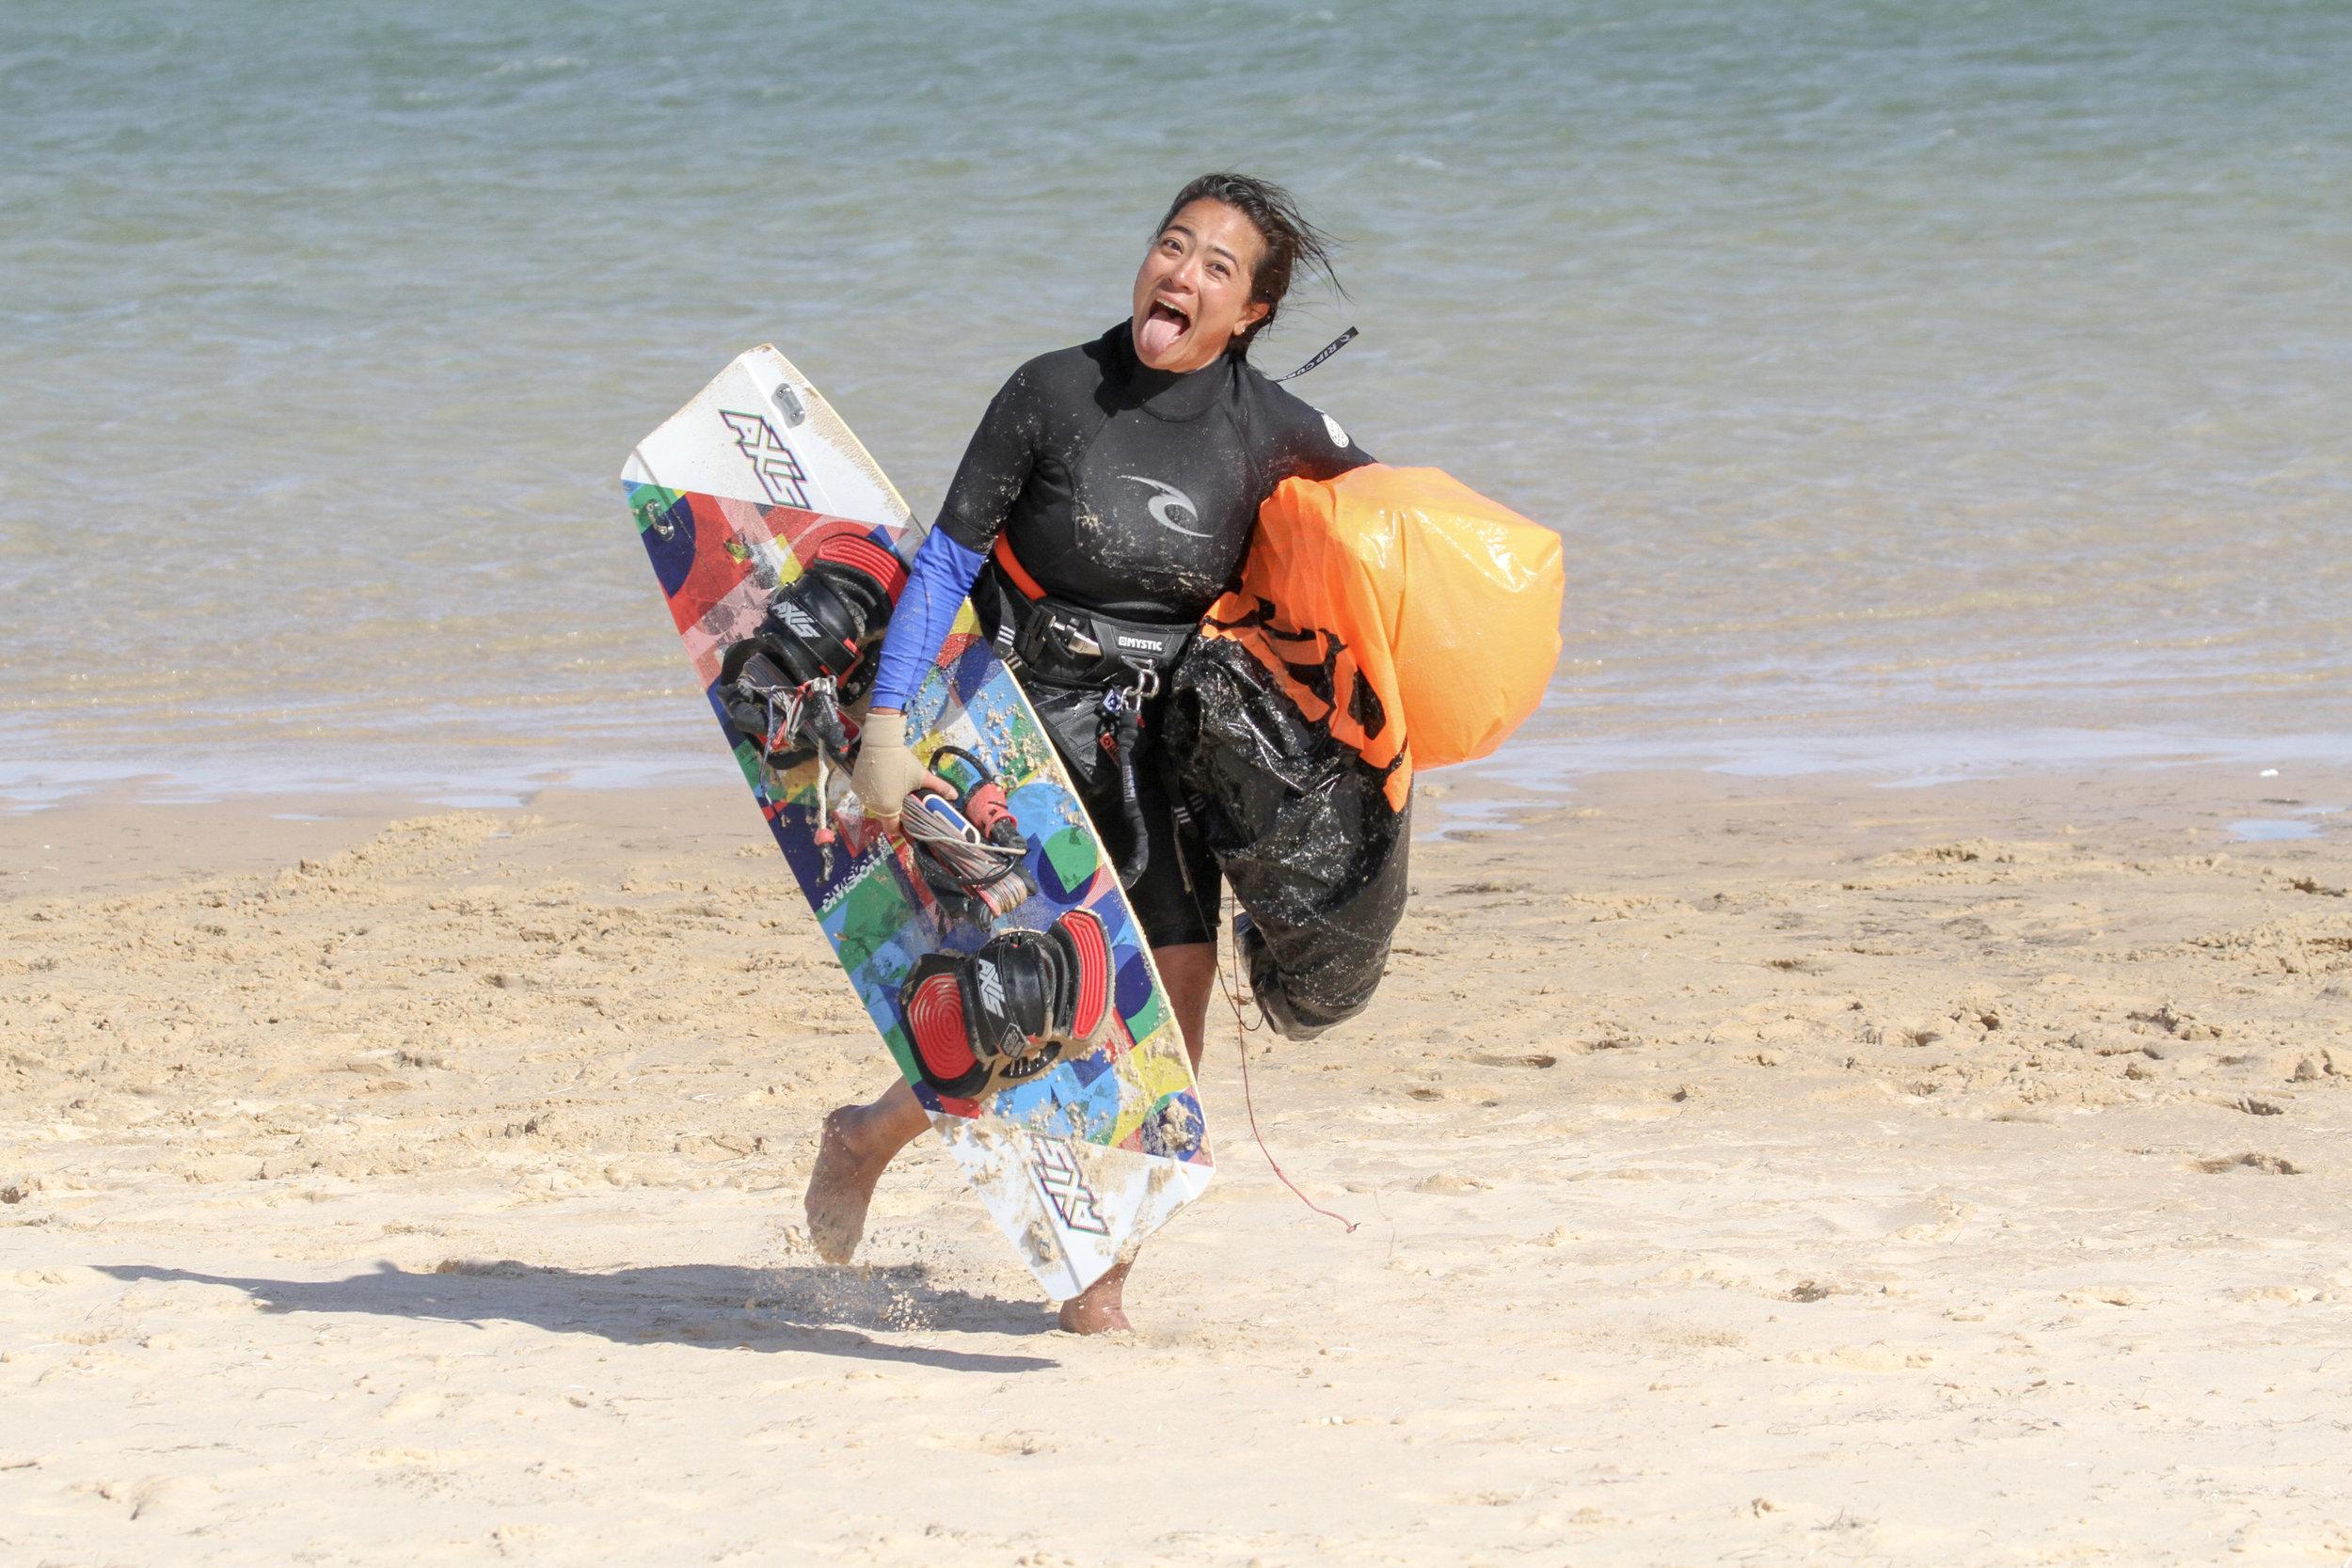 Dakhla kitesurf trip : Kite Control Portugal kitesurf school.jpg